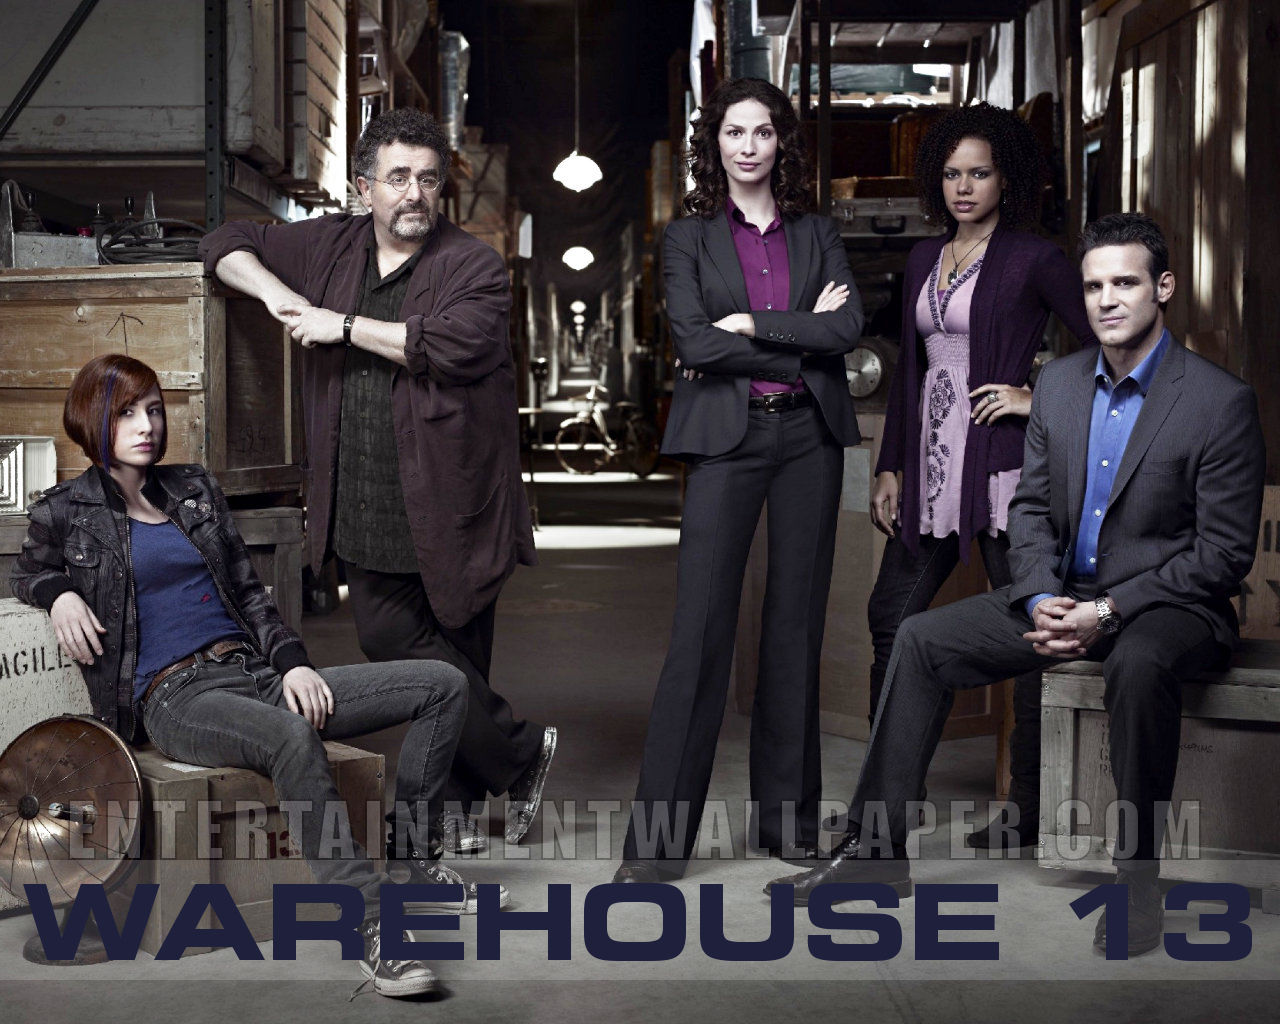 Warehouse 13 renewed for Season 3